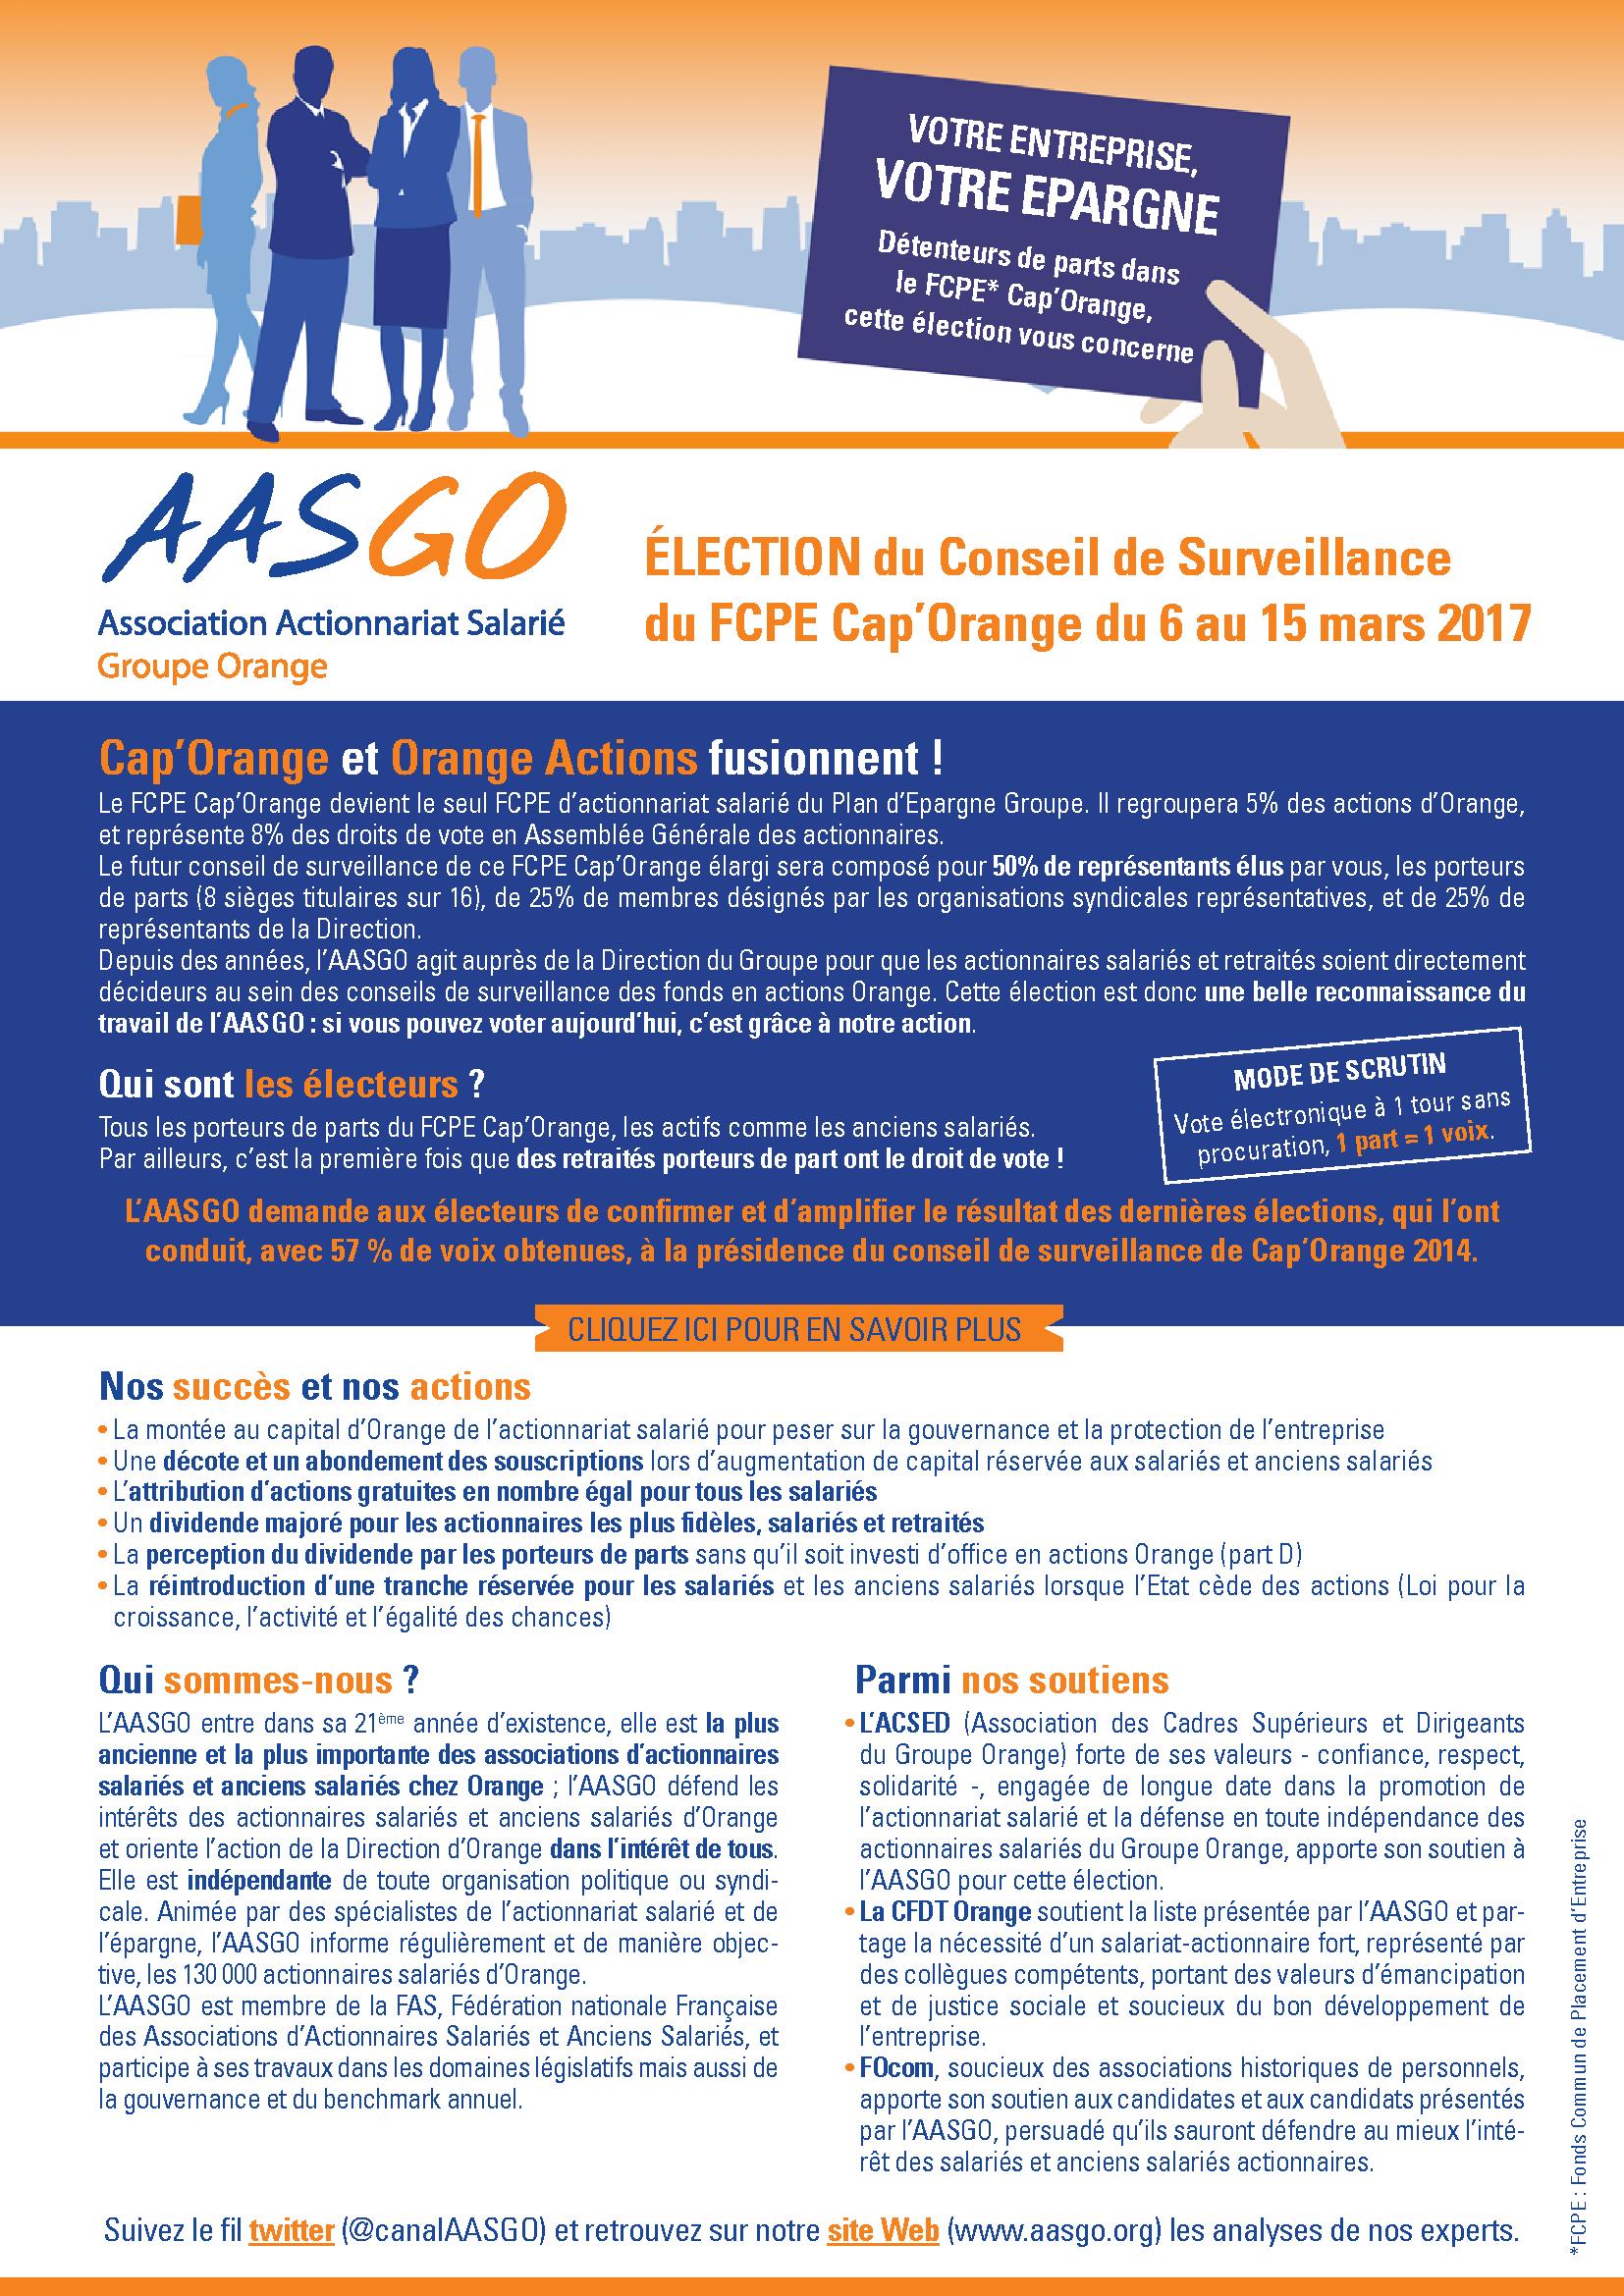 http://www.emailing.sce.cfdt-ftorange.fr/images/ScePublicCom/Elections/Elections-2017/20170301-Profession_de_foi_AASGO-elections-representants-Cap_Orange.PDF